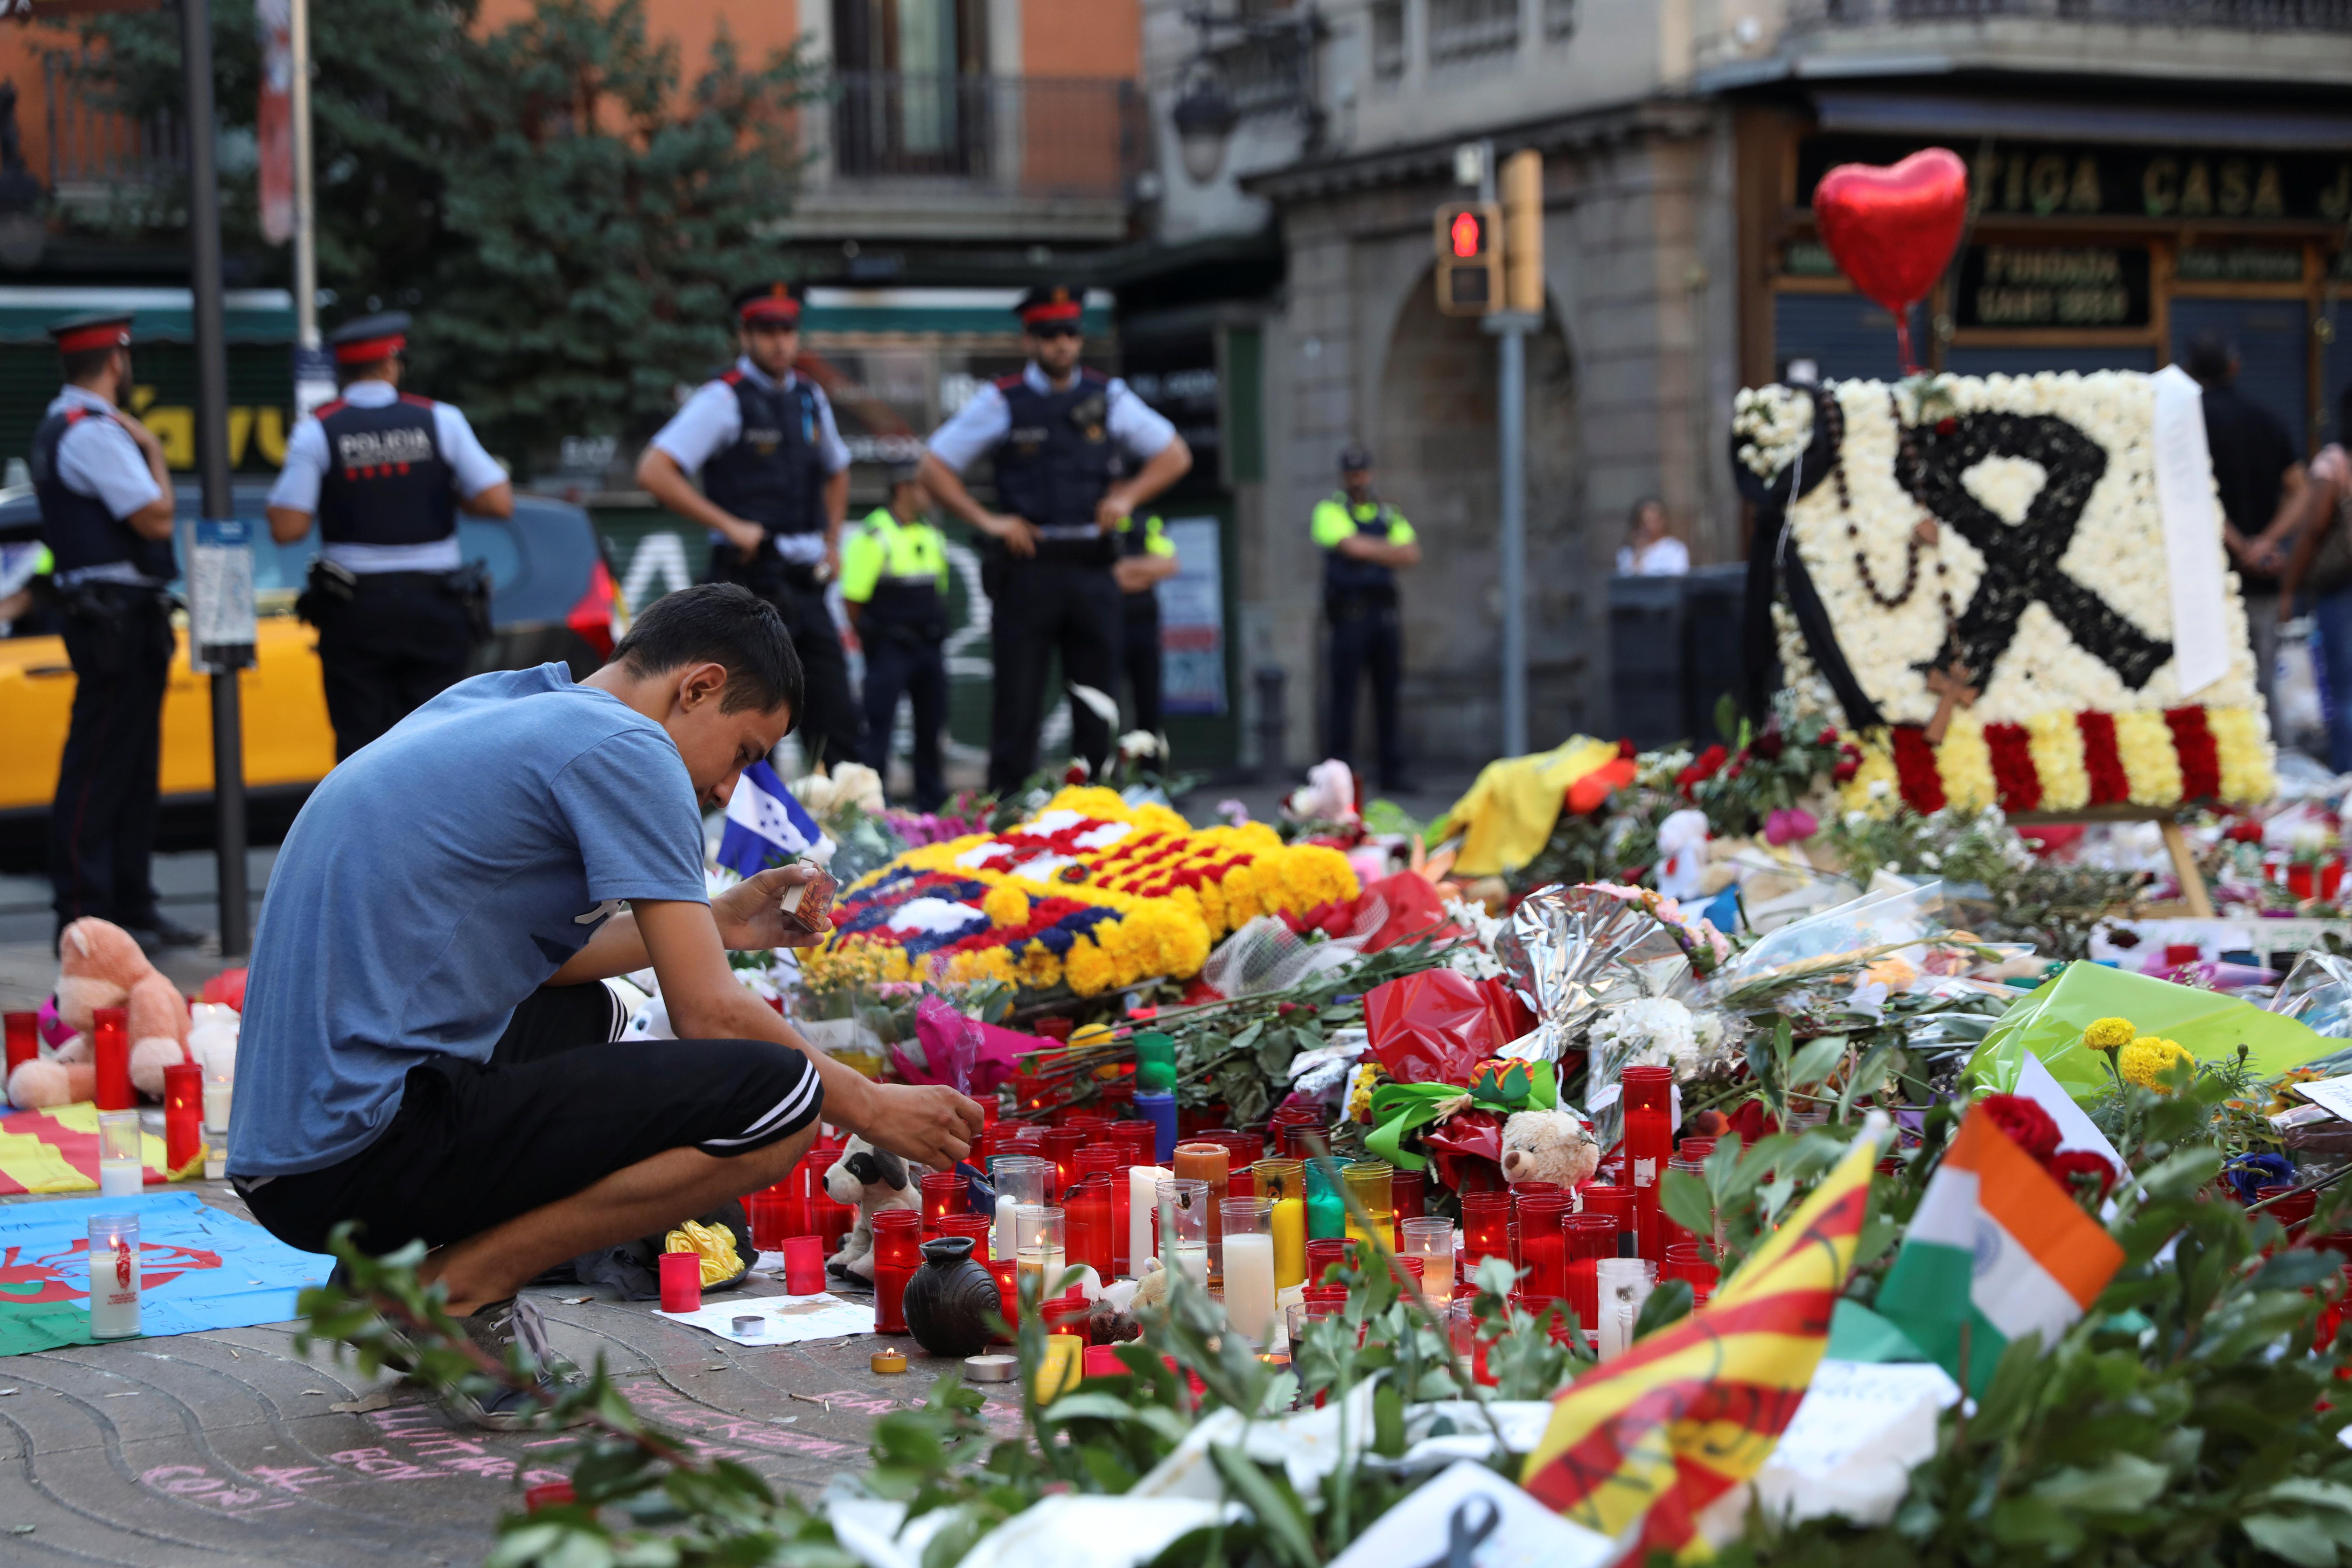 A man lights a candle at an impromptu memorial where a van crashed into pedestrians at Las Ramblas in Barcelona, Spain August 21, 2017. REUTERS/Susana Vera - RTS1CLTL